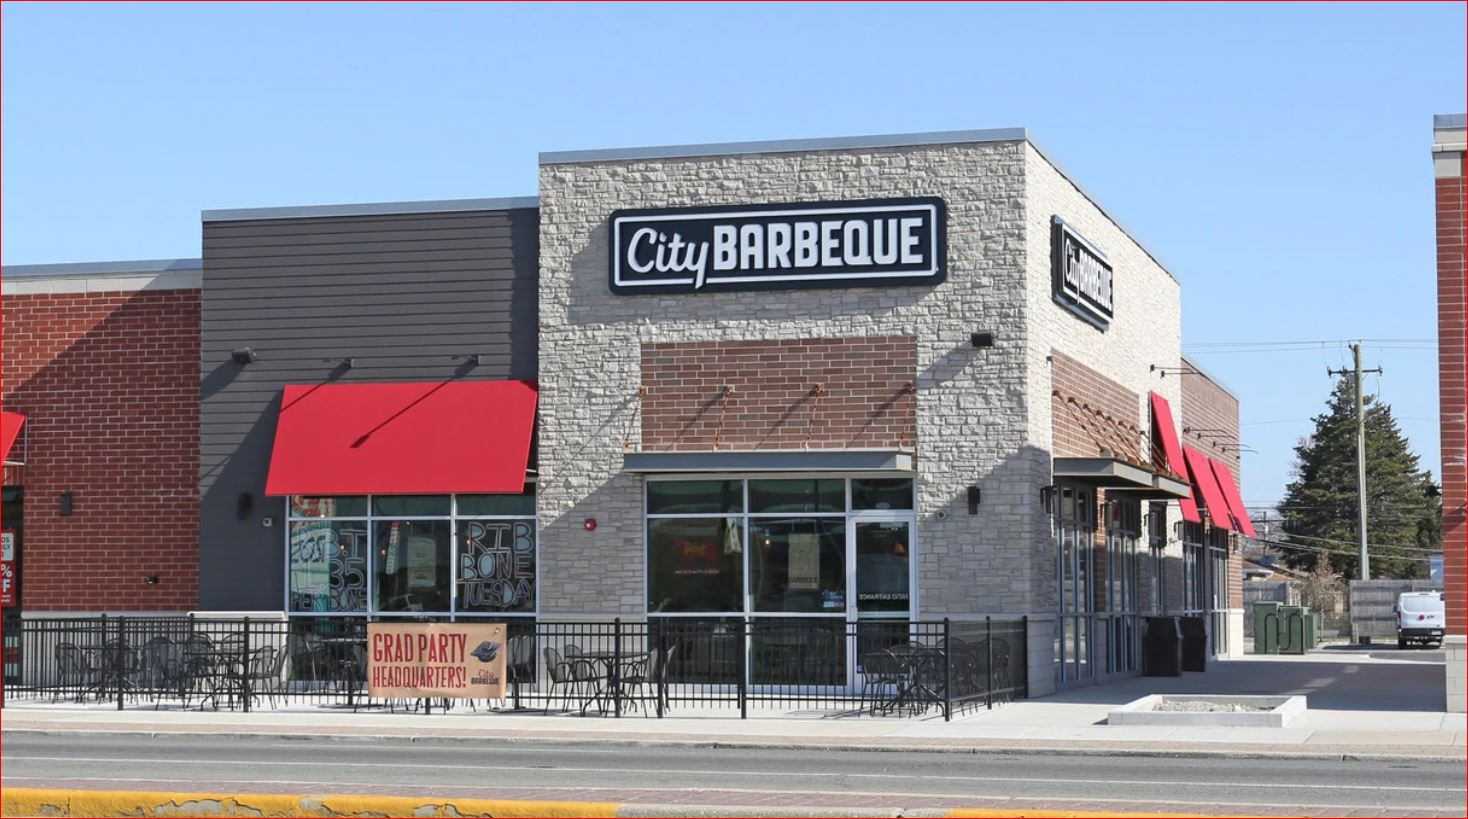 City Barbeque Customer Feedback Survey